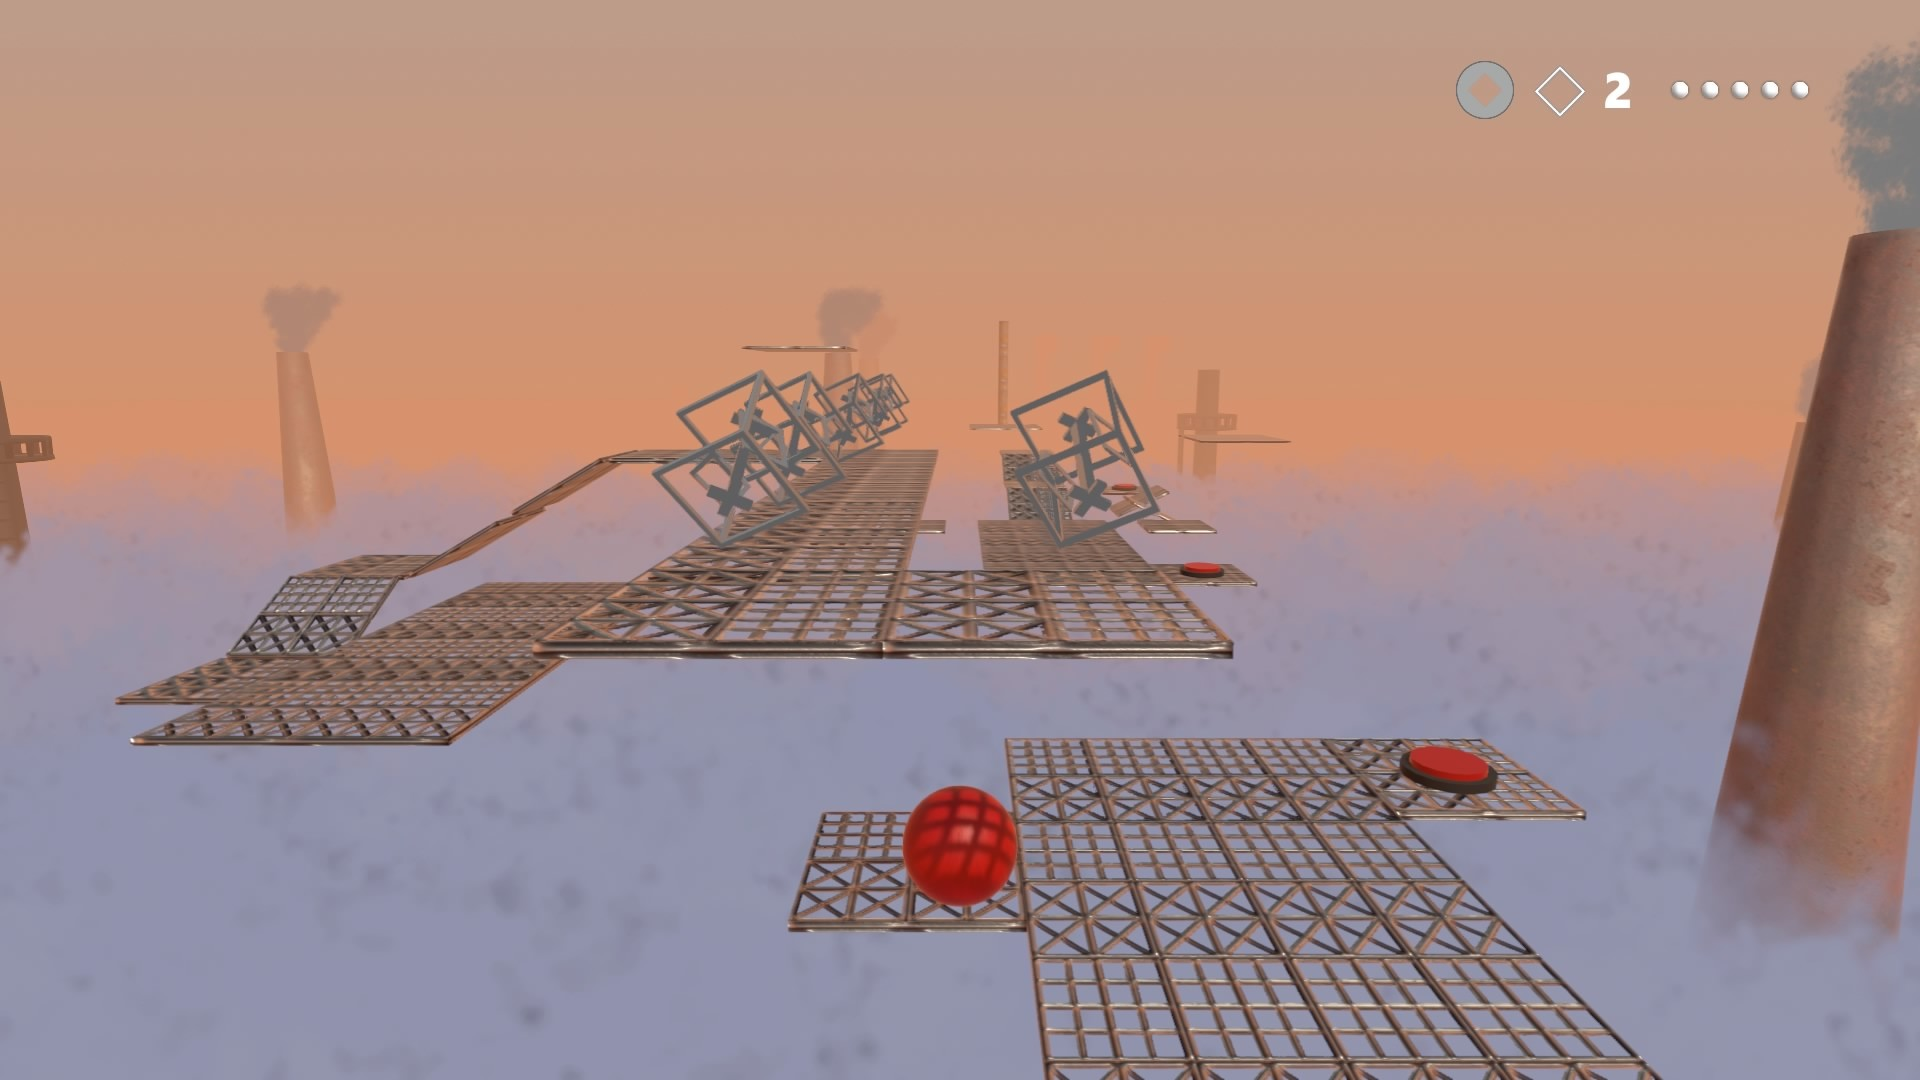 The Perplexing Orb 2 screenshot